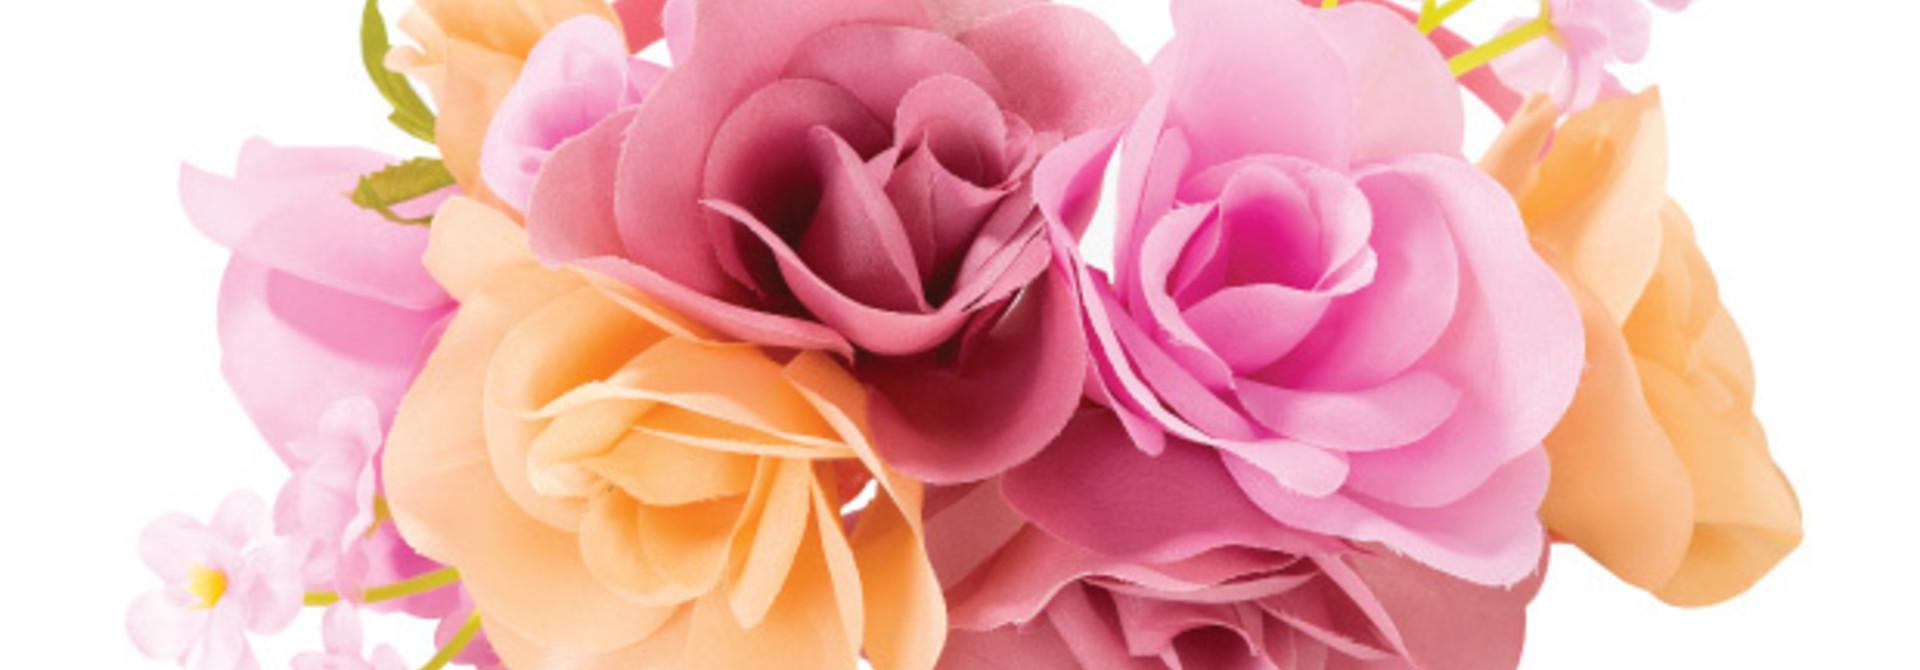 Bloemenkroon haarband Blossom Girls - Talking Tables